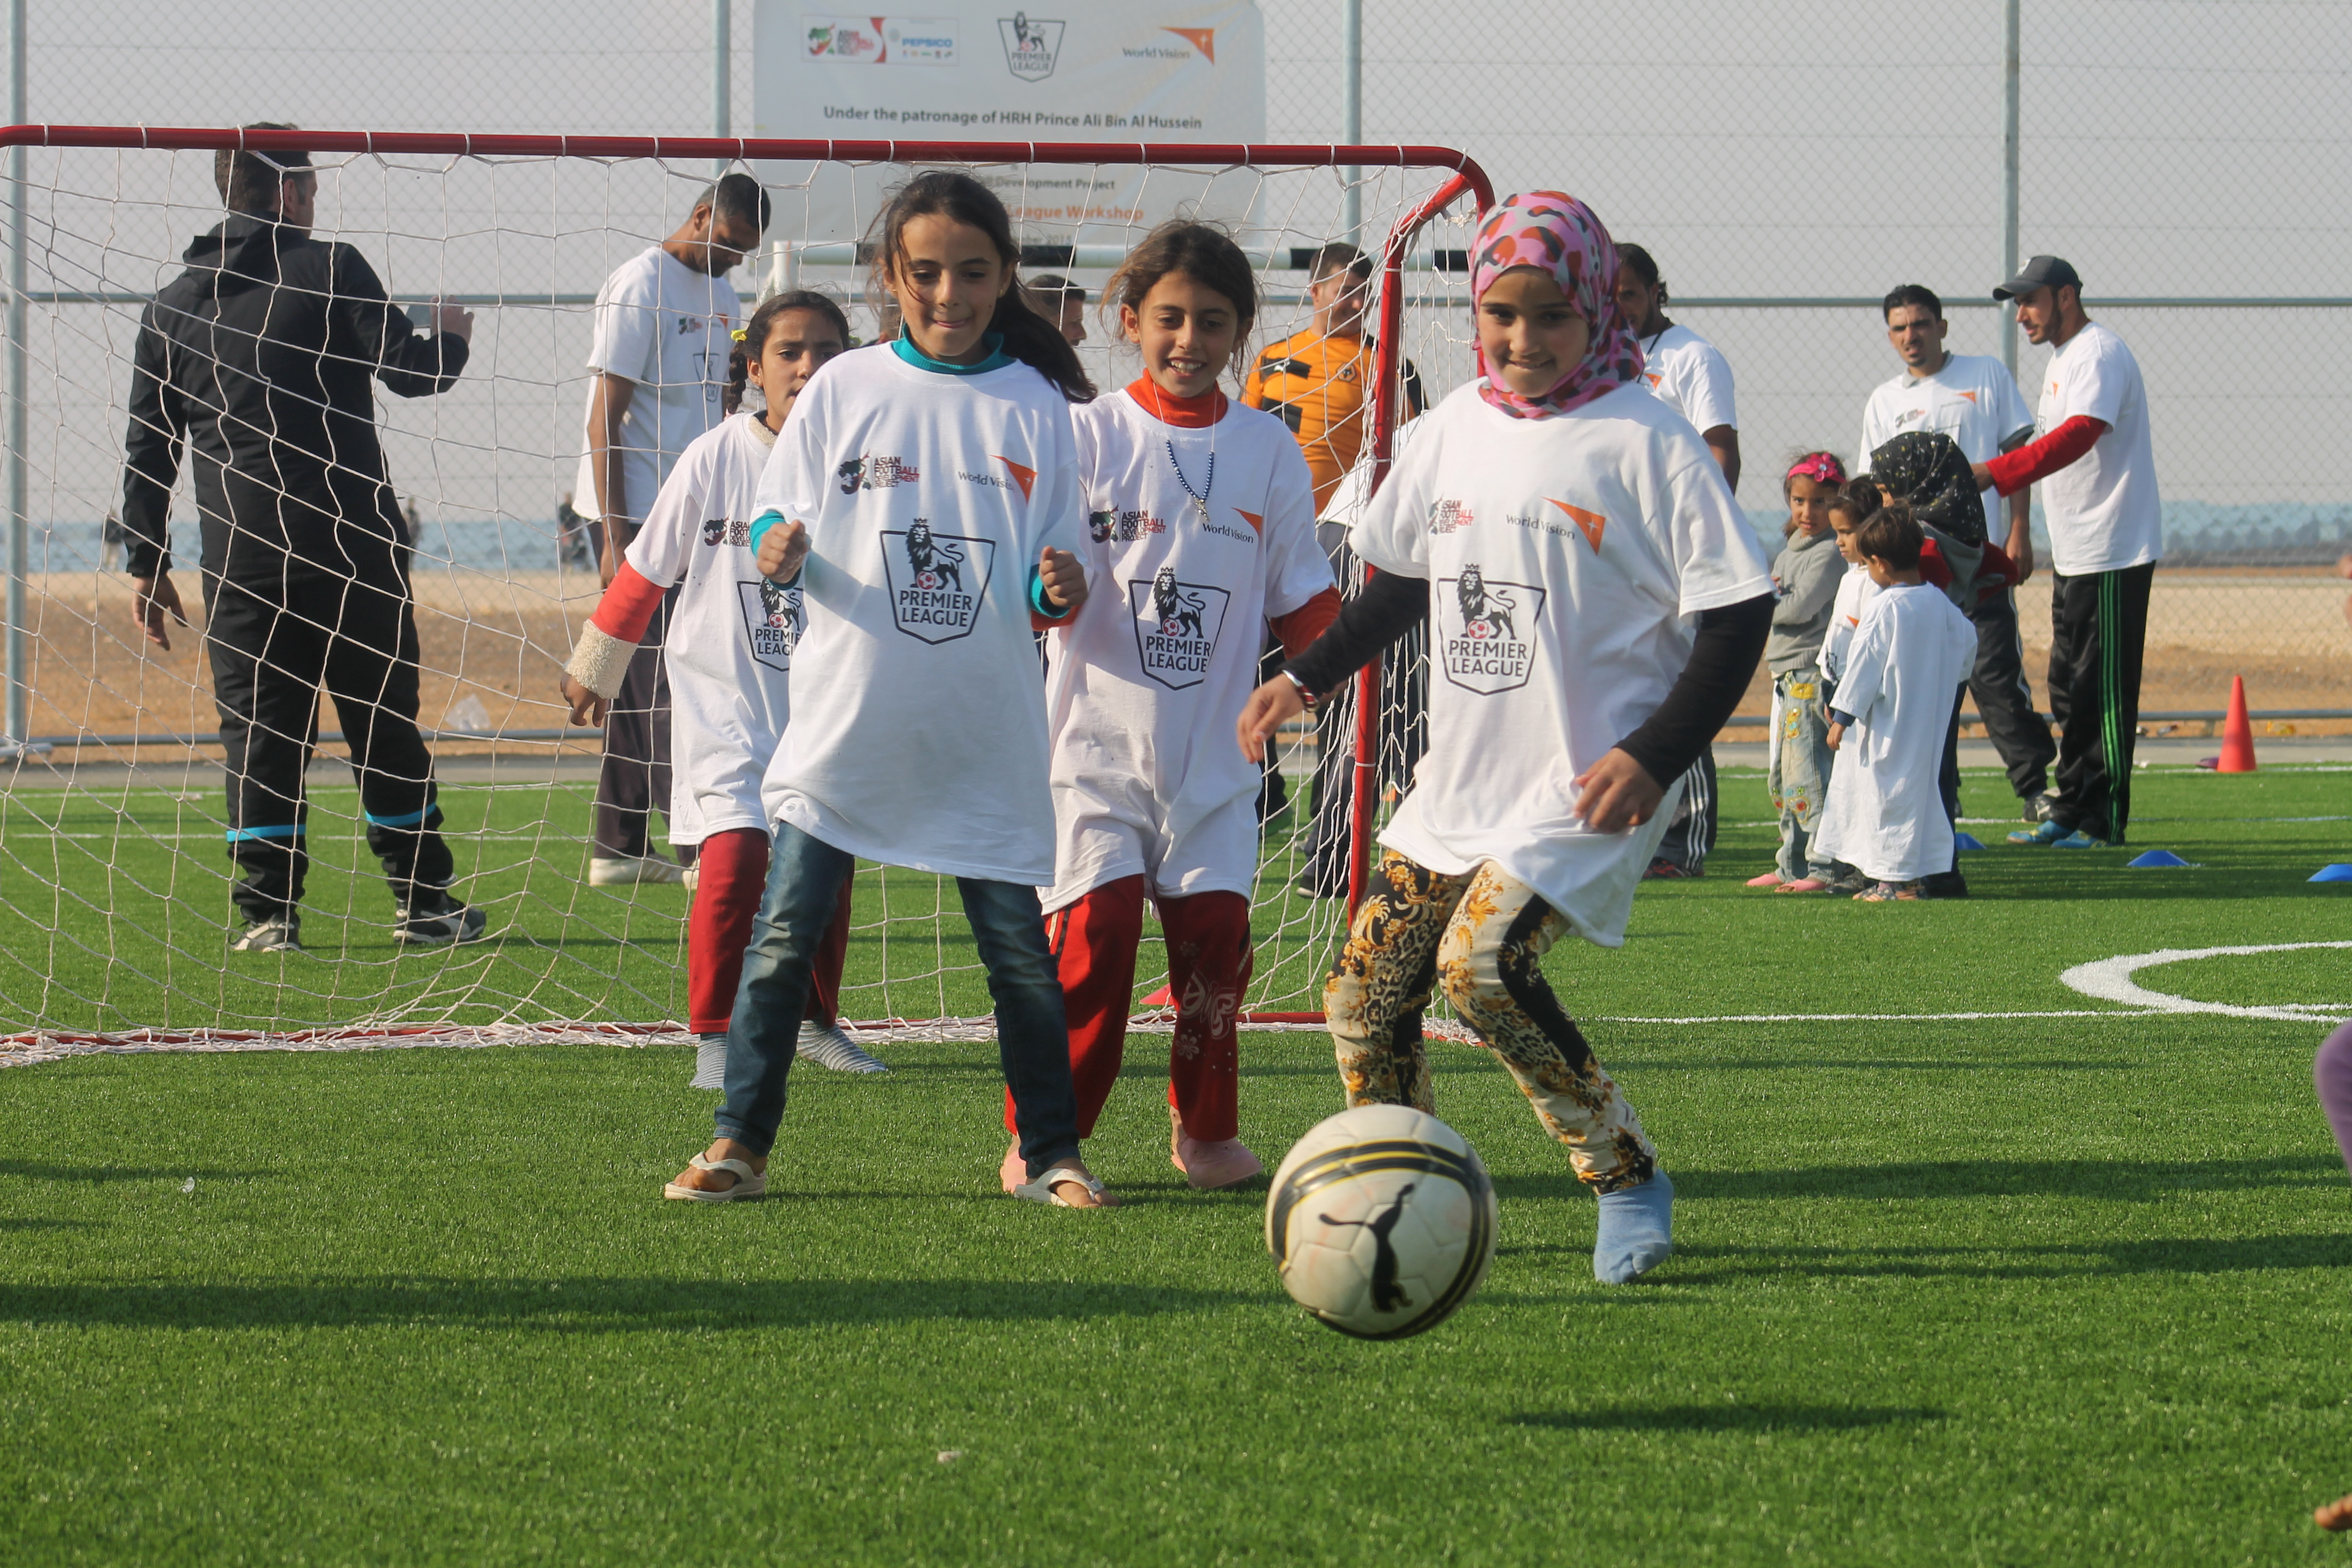 PL_Workshop_Football_Festival_Nov._19_2015_Azraq_Camp_21.JPG